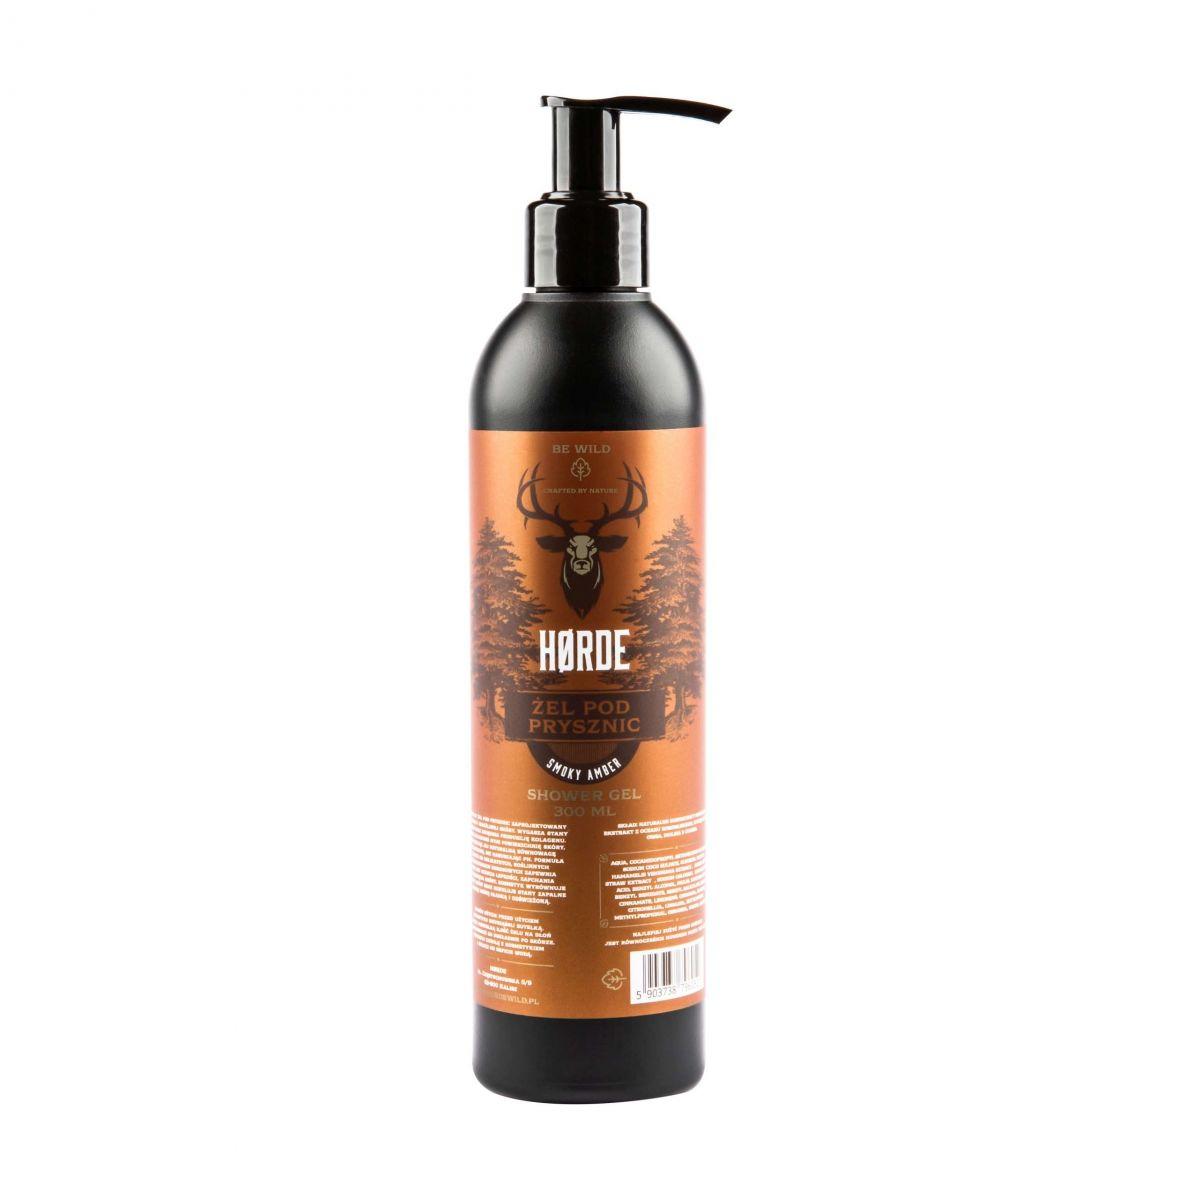 Żel pod prysznic Smoky Amber -300ml - Horde